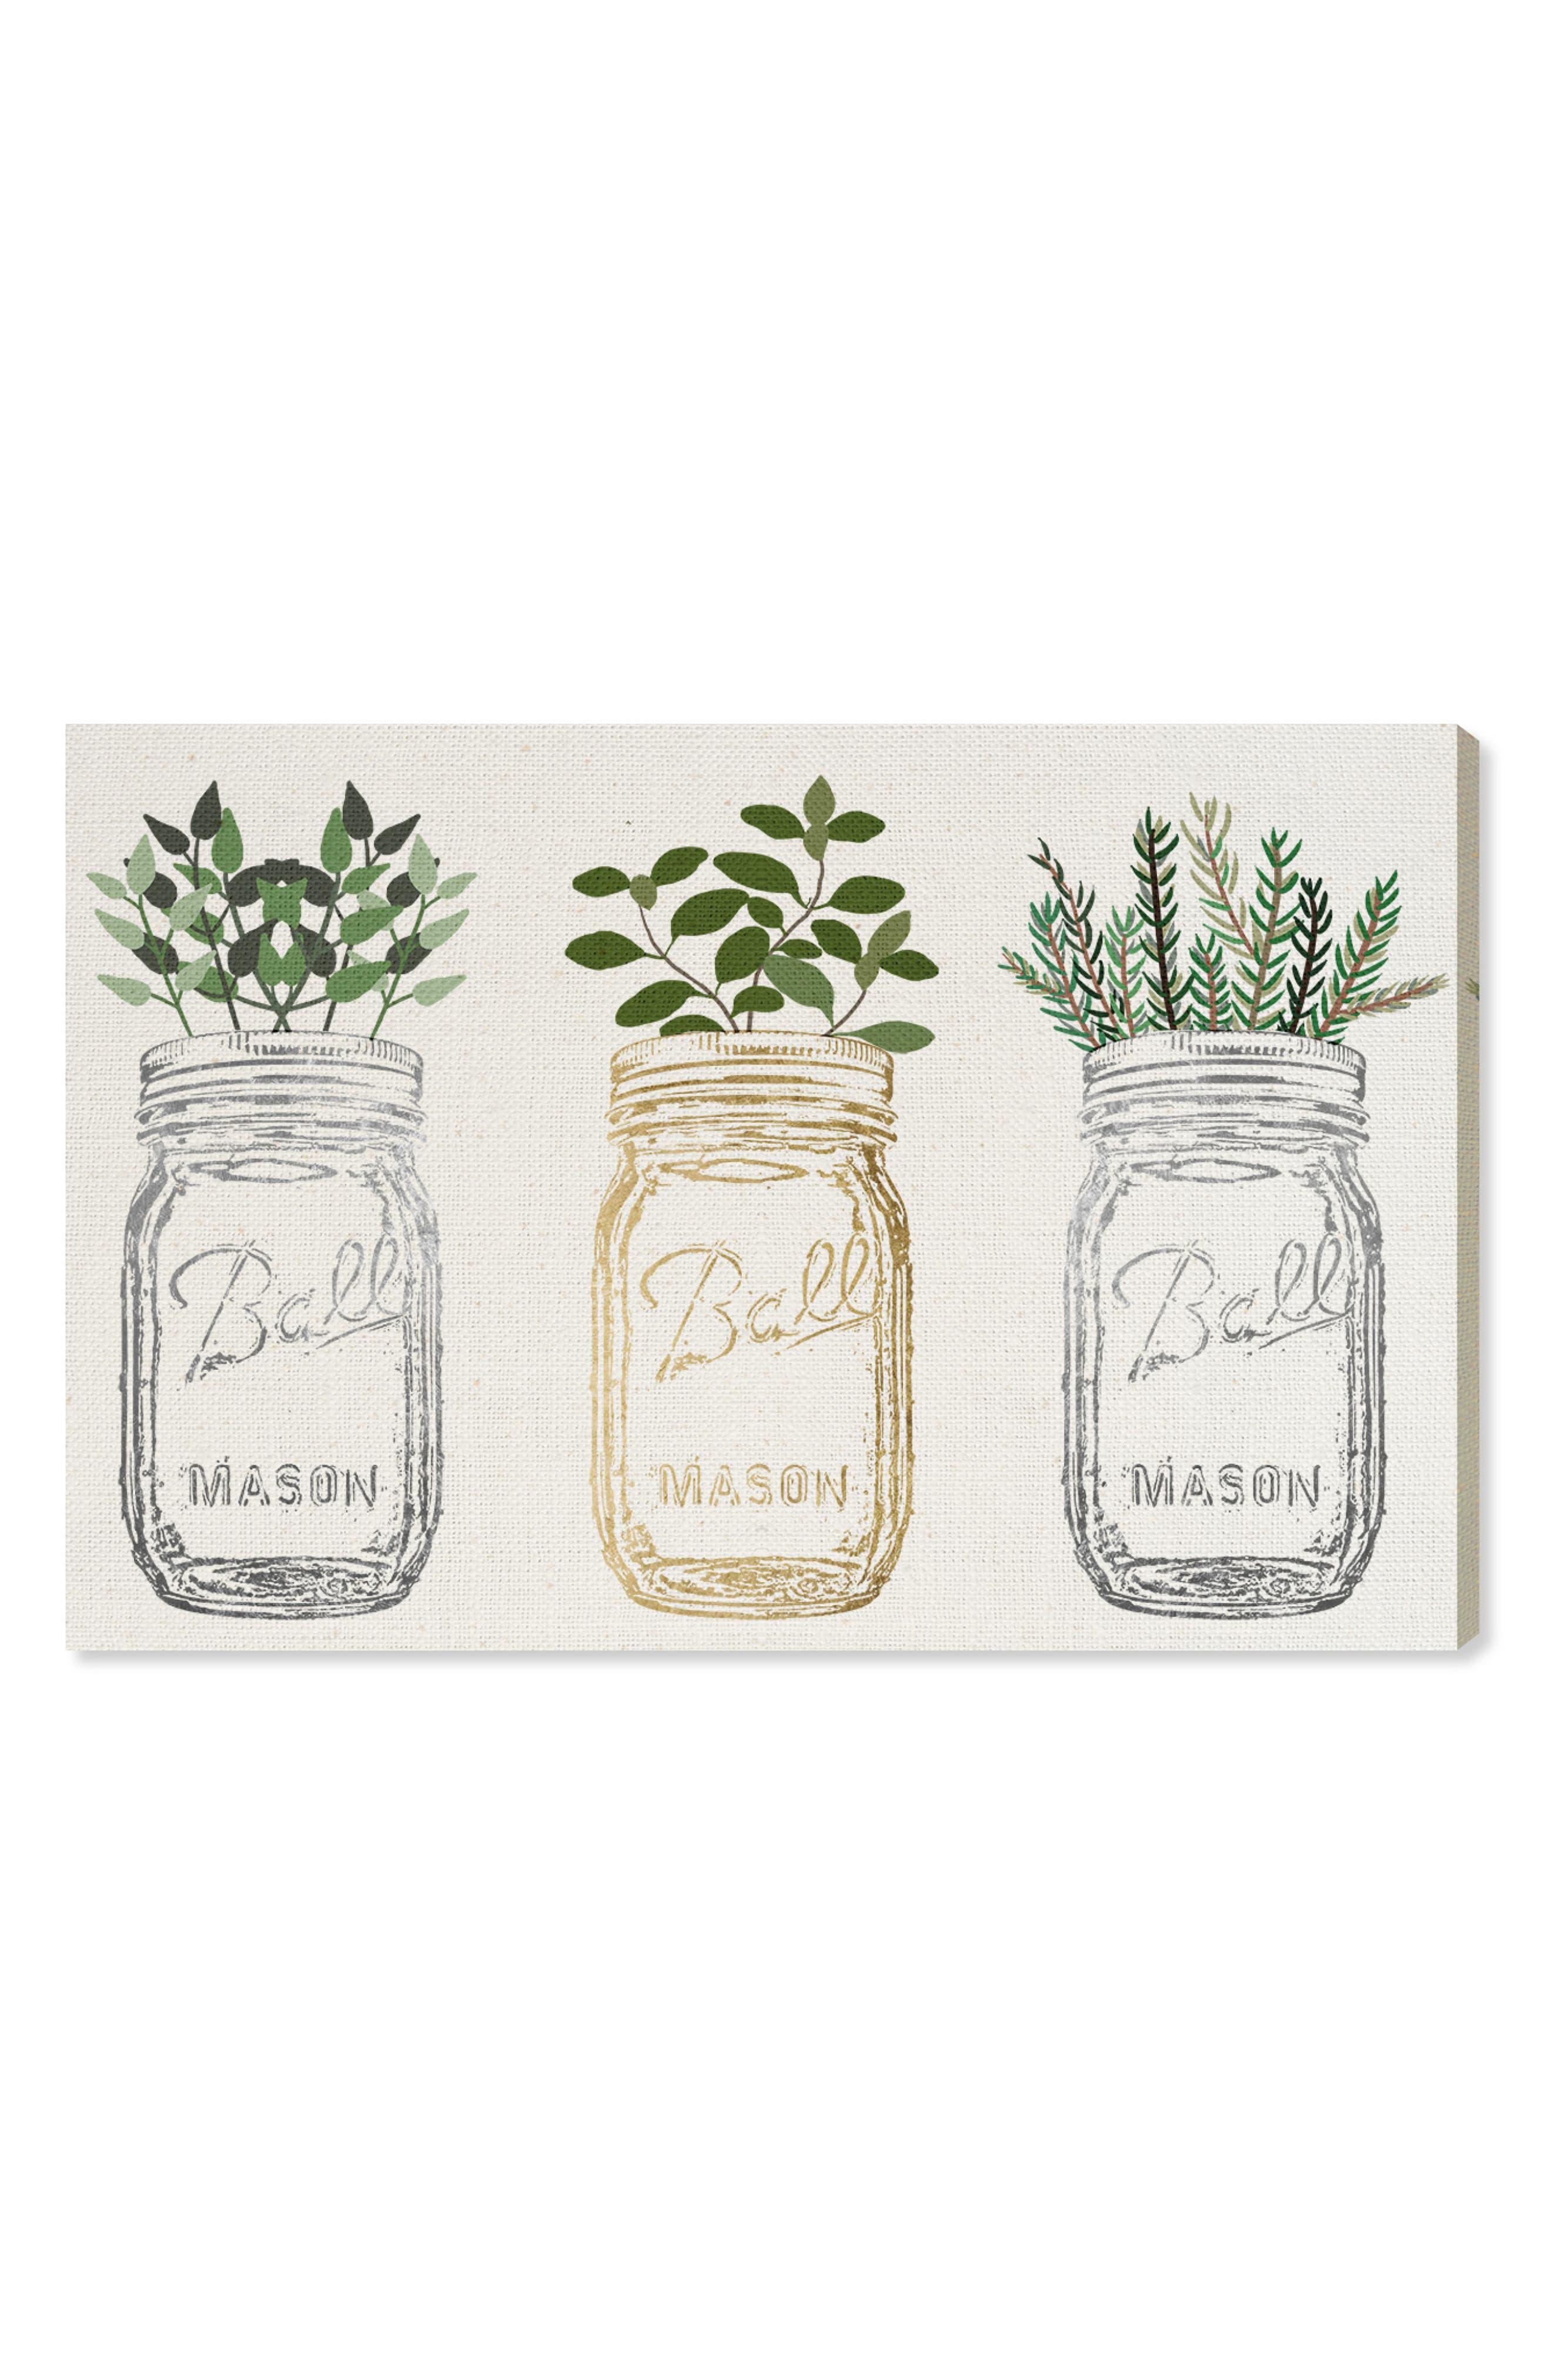 Mason Jars & Plants Canvas Wall Art,                             Main thumbnail 1, color,                             WHITE